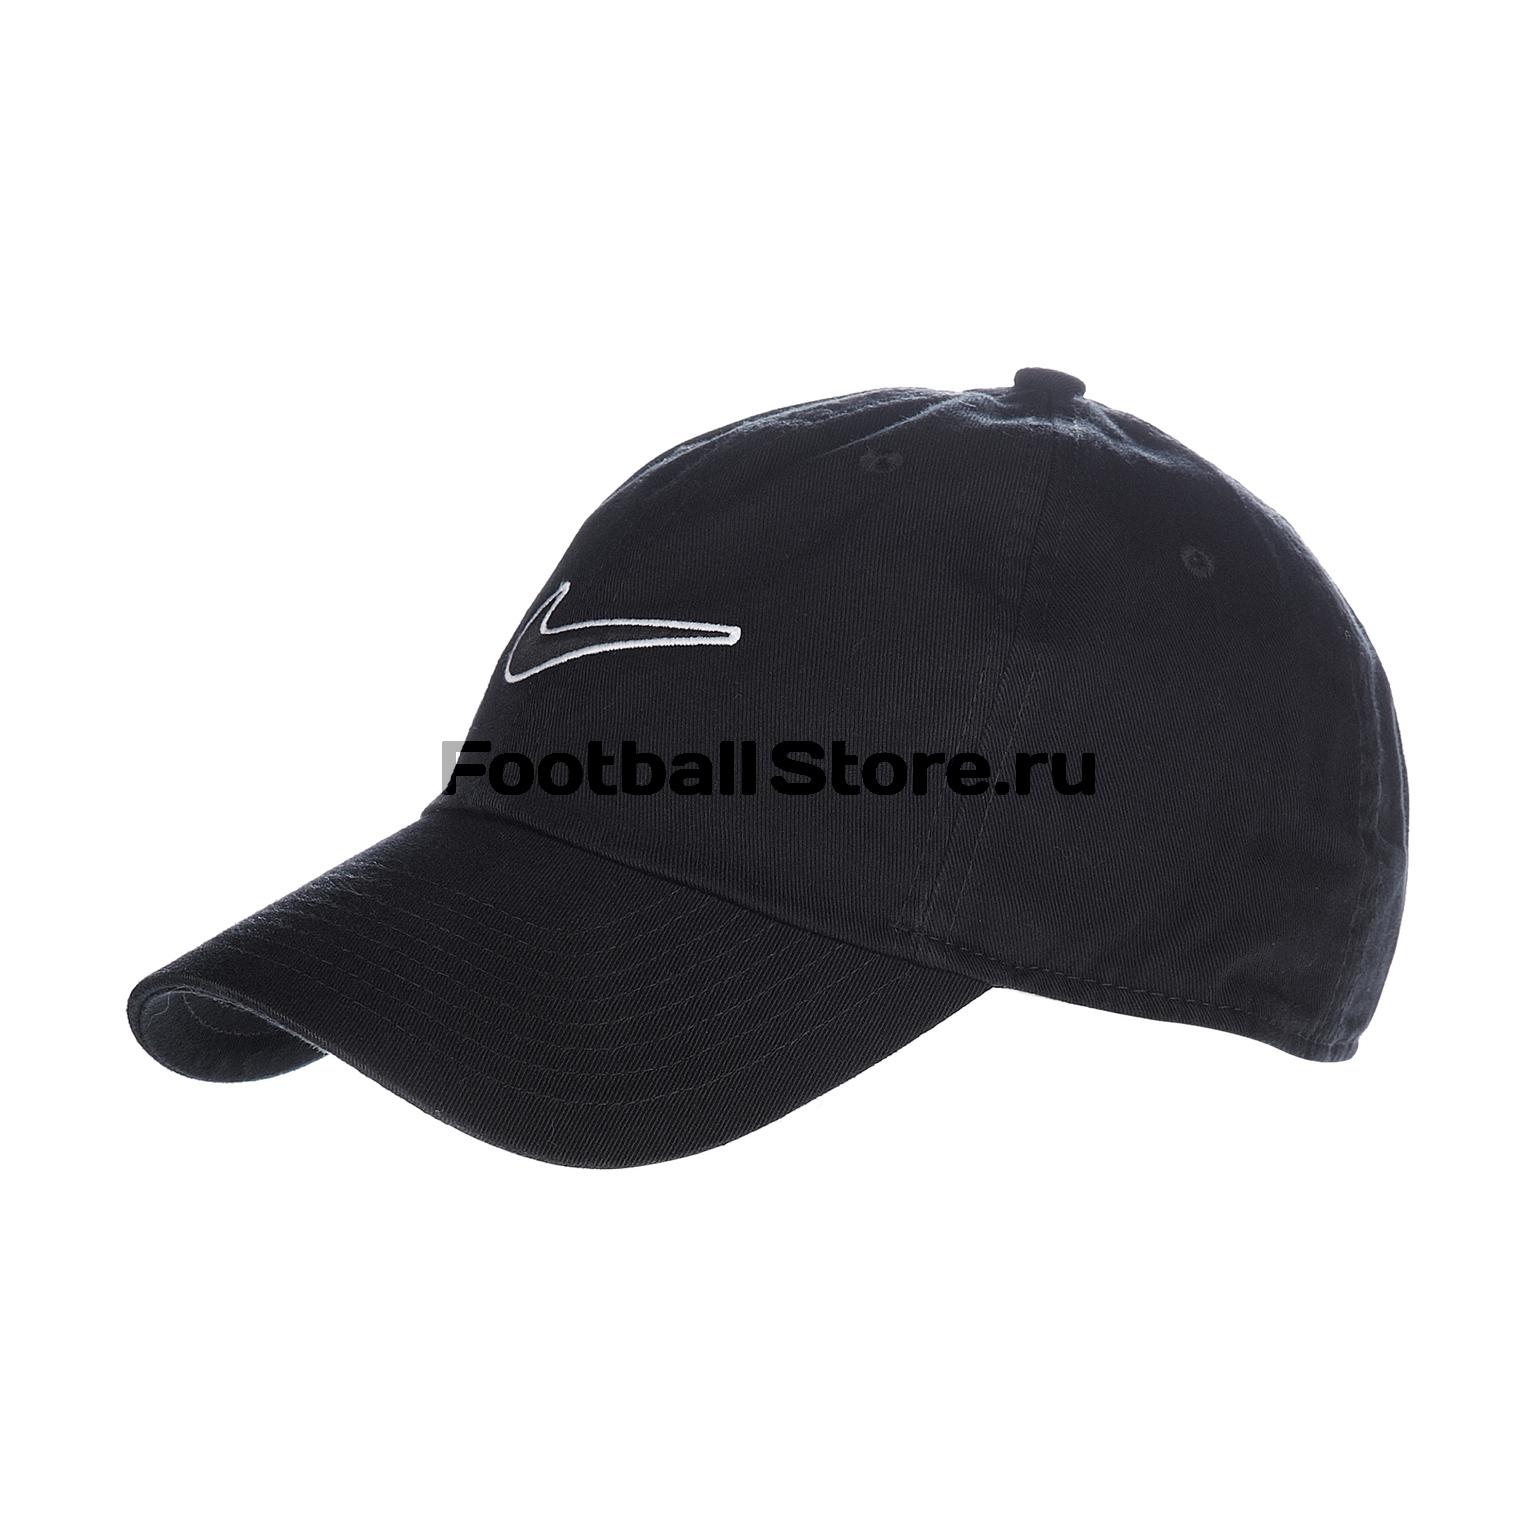 Бейсболка Nike Essential Swoosh 943091-010 одежда для гольфа nike 639790 101 010 089 639790